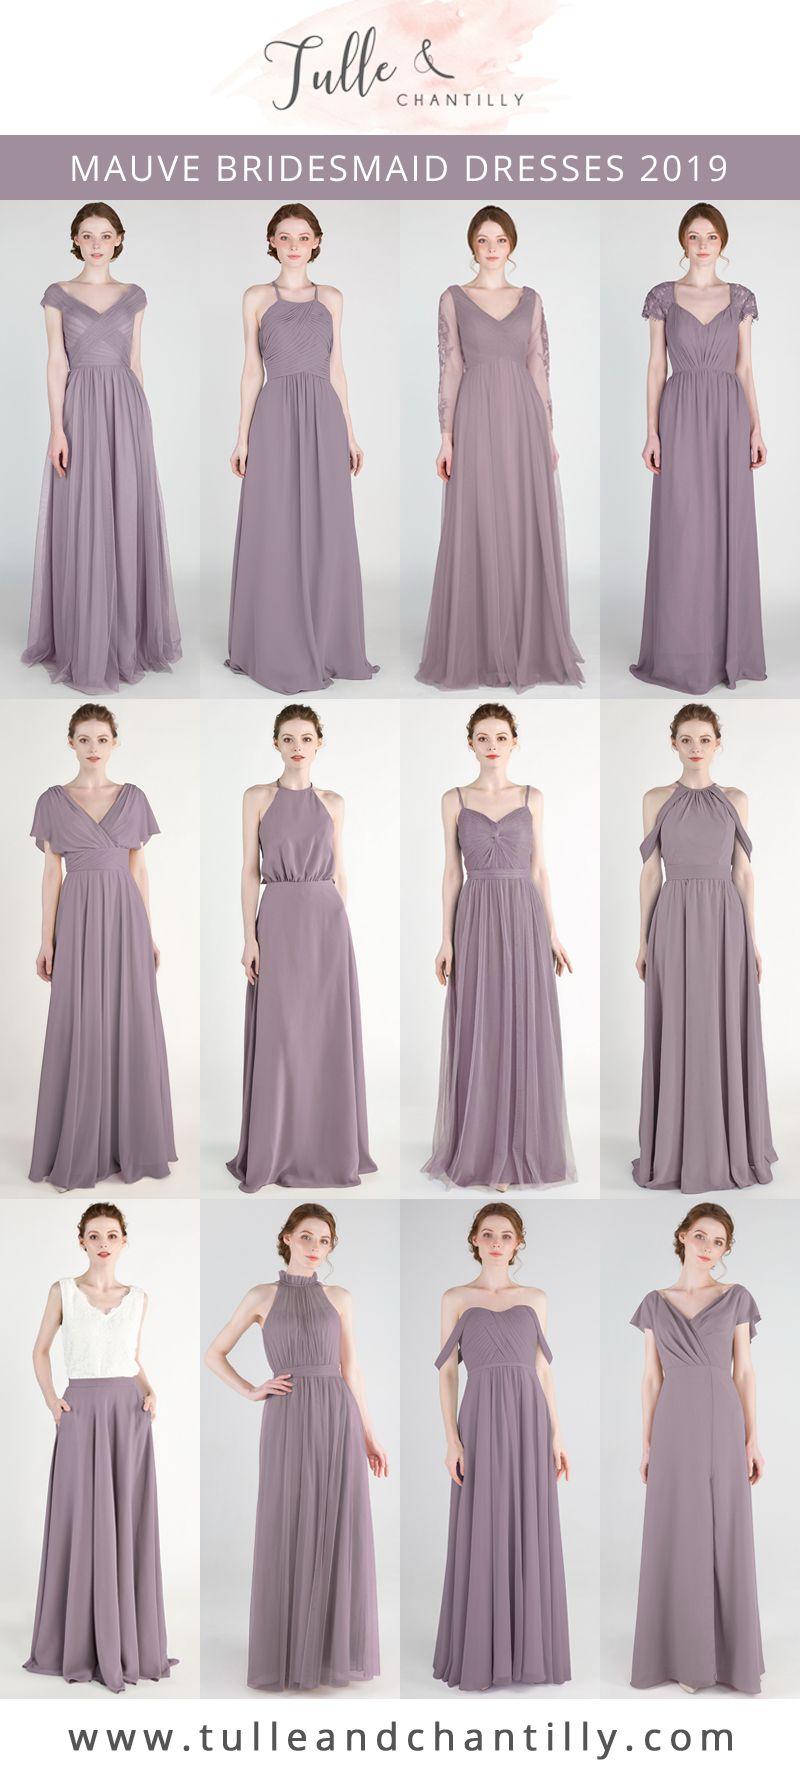 Long Short Bridesmaid Dresses 79 149 Size 0 30 And 50 Colors Cheap Chiffon Bridesmaid Dresses Lavender Bridesmaid Dresses Bridesmaid Dresses Long Chiffon [ 1772 x 800 Pixel ]